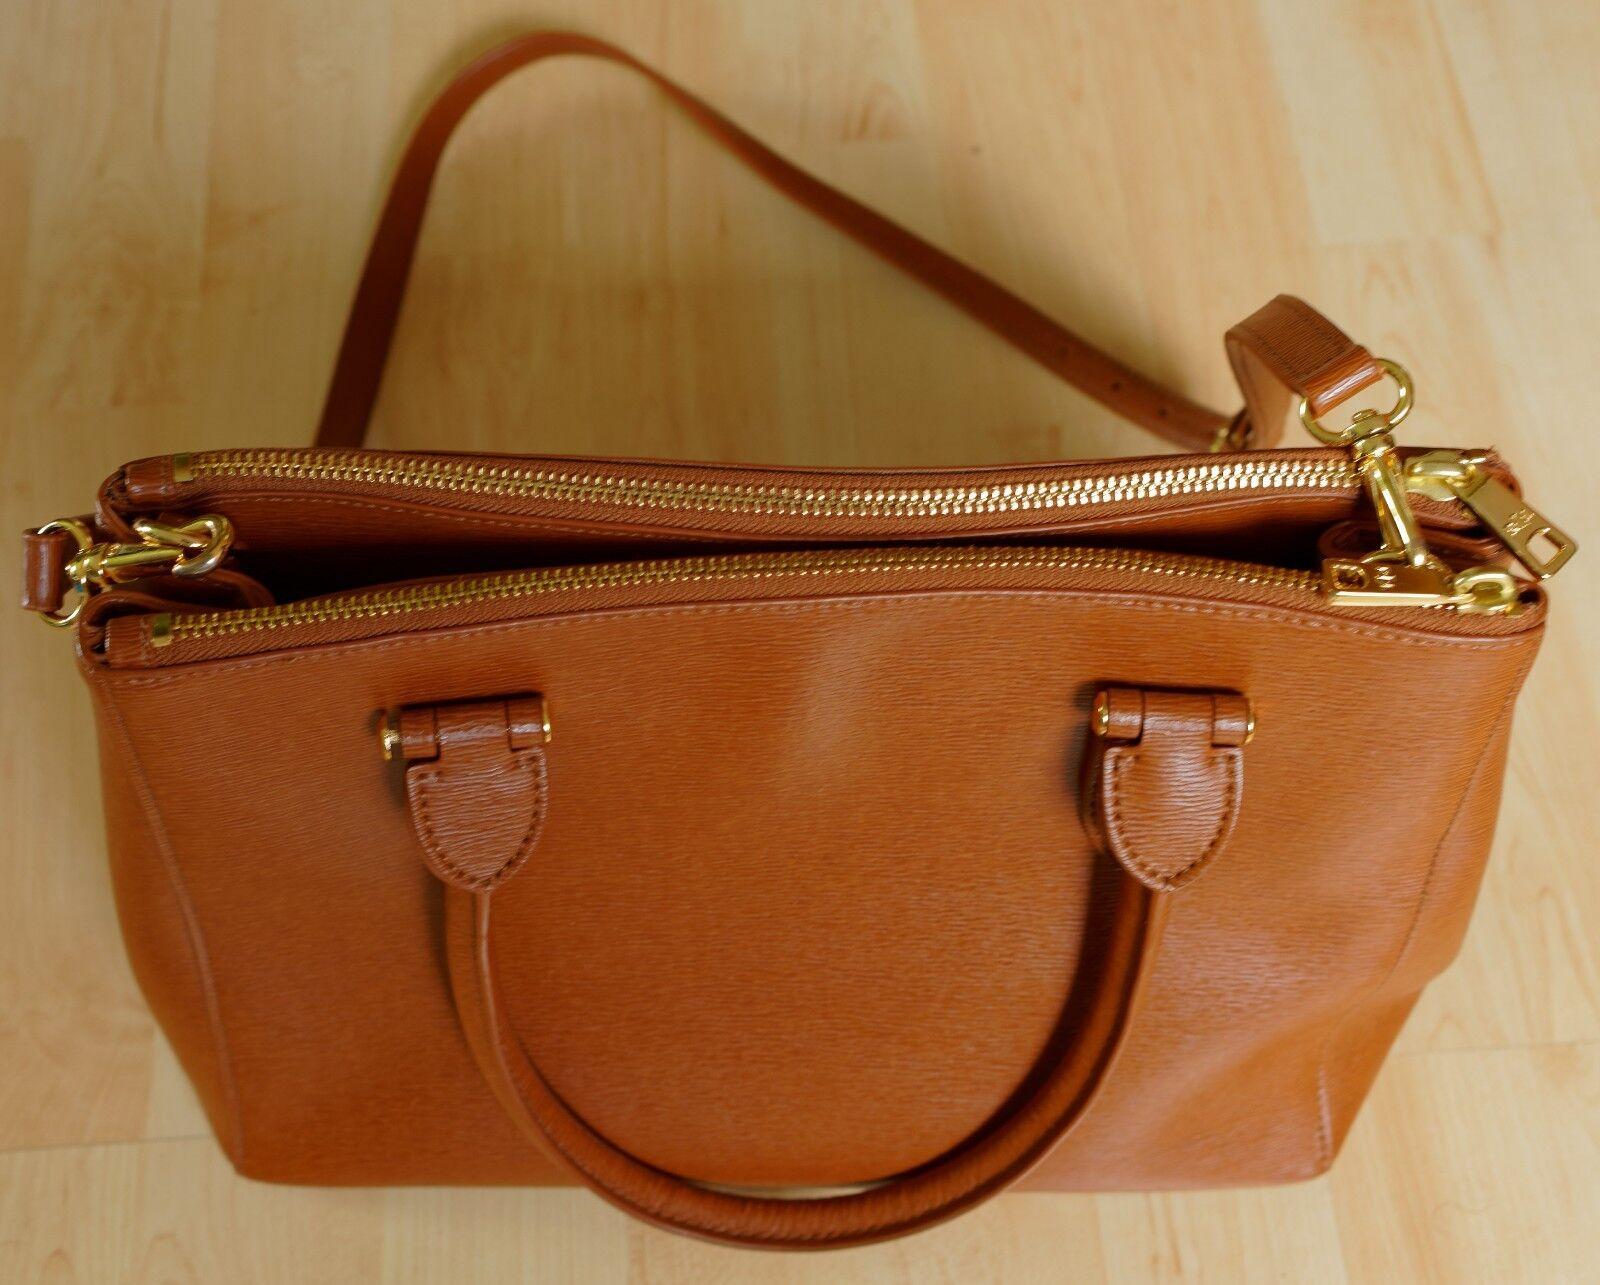 6ac9741c2ba83 Lauren Ralph Lauren Tasche Newbury Handtasche hell braun braun braun  Reißverschluss